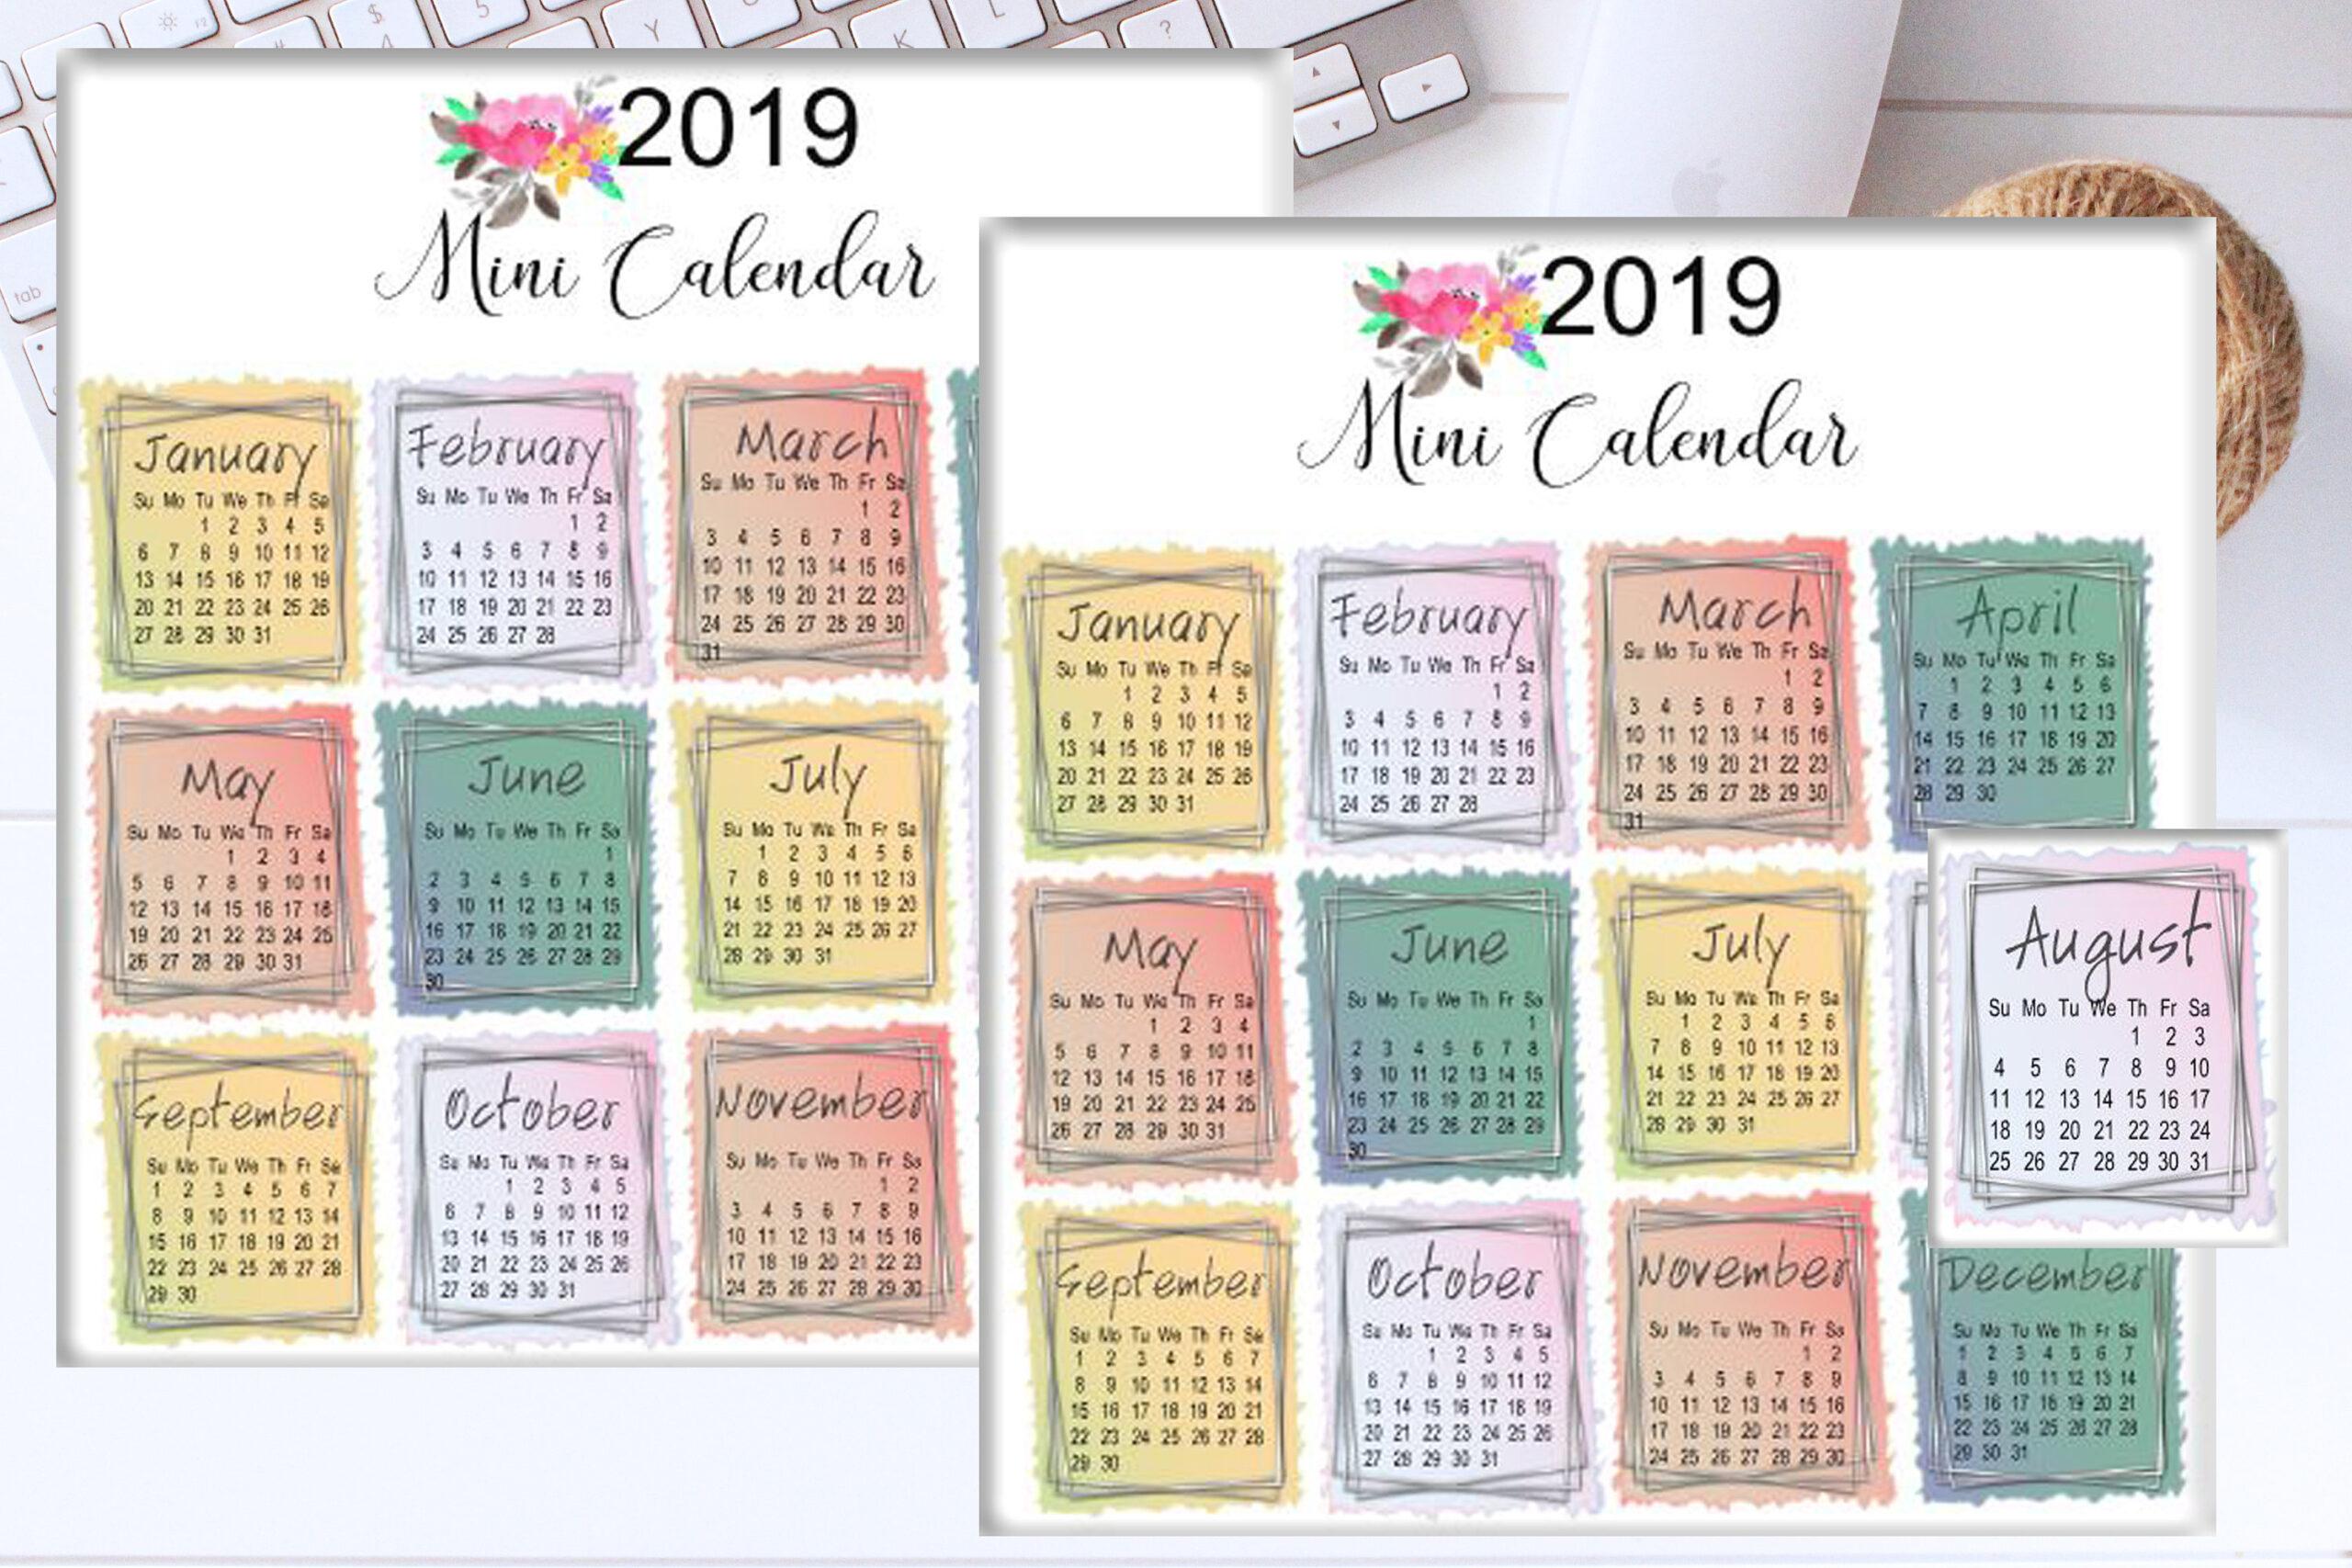 2019 Mini Calendar Stickers / Small Calendar Stickers